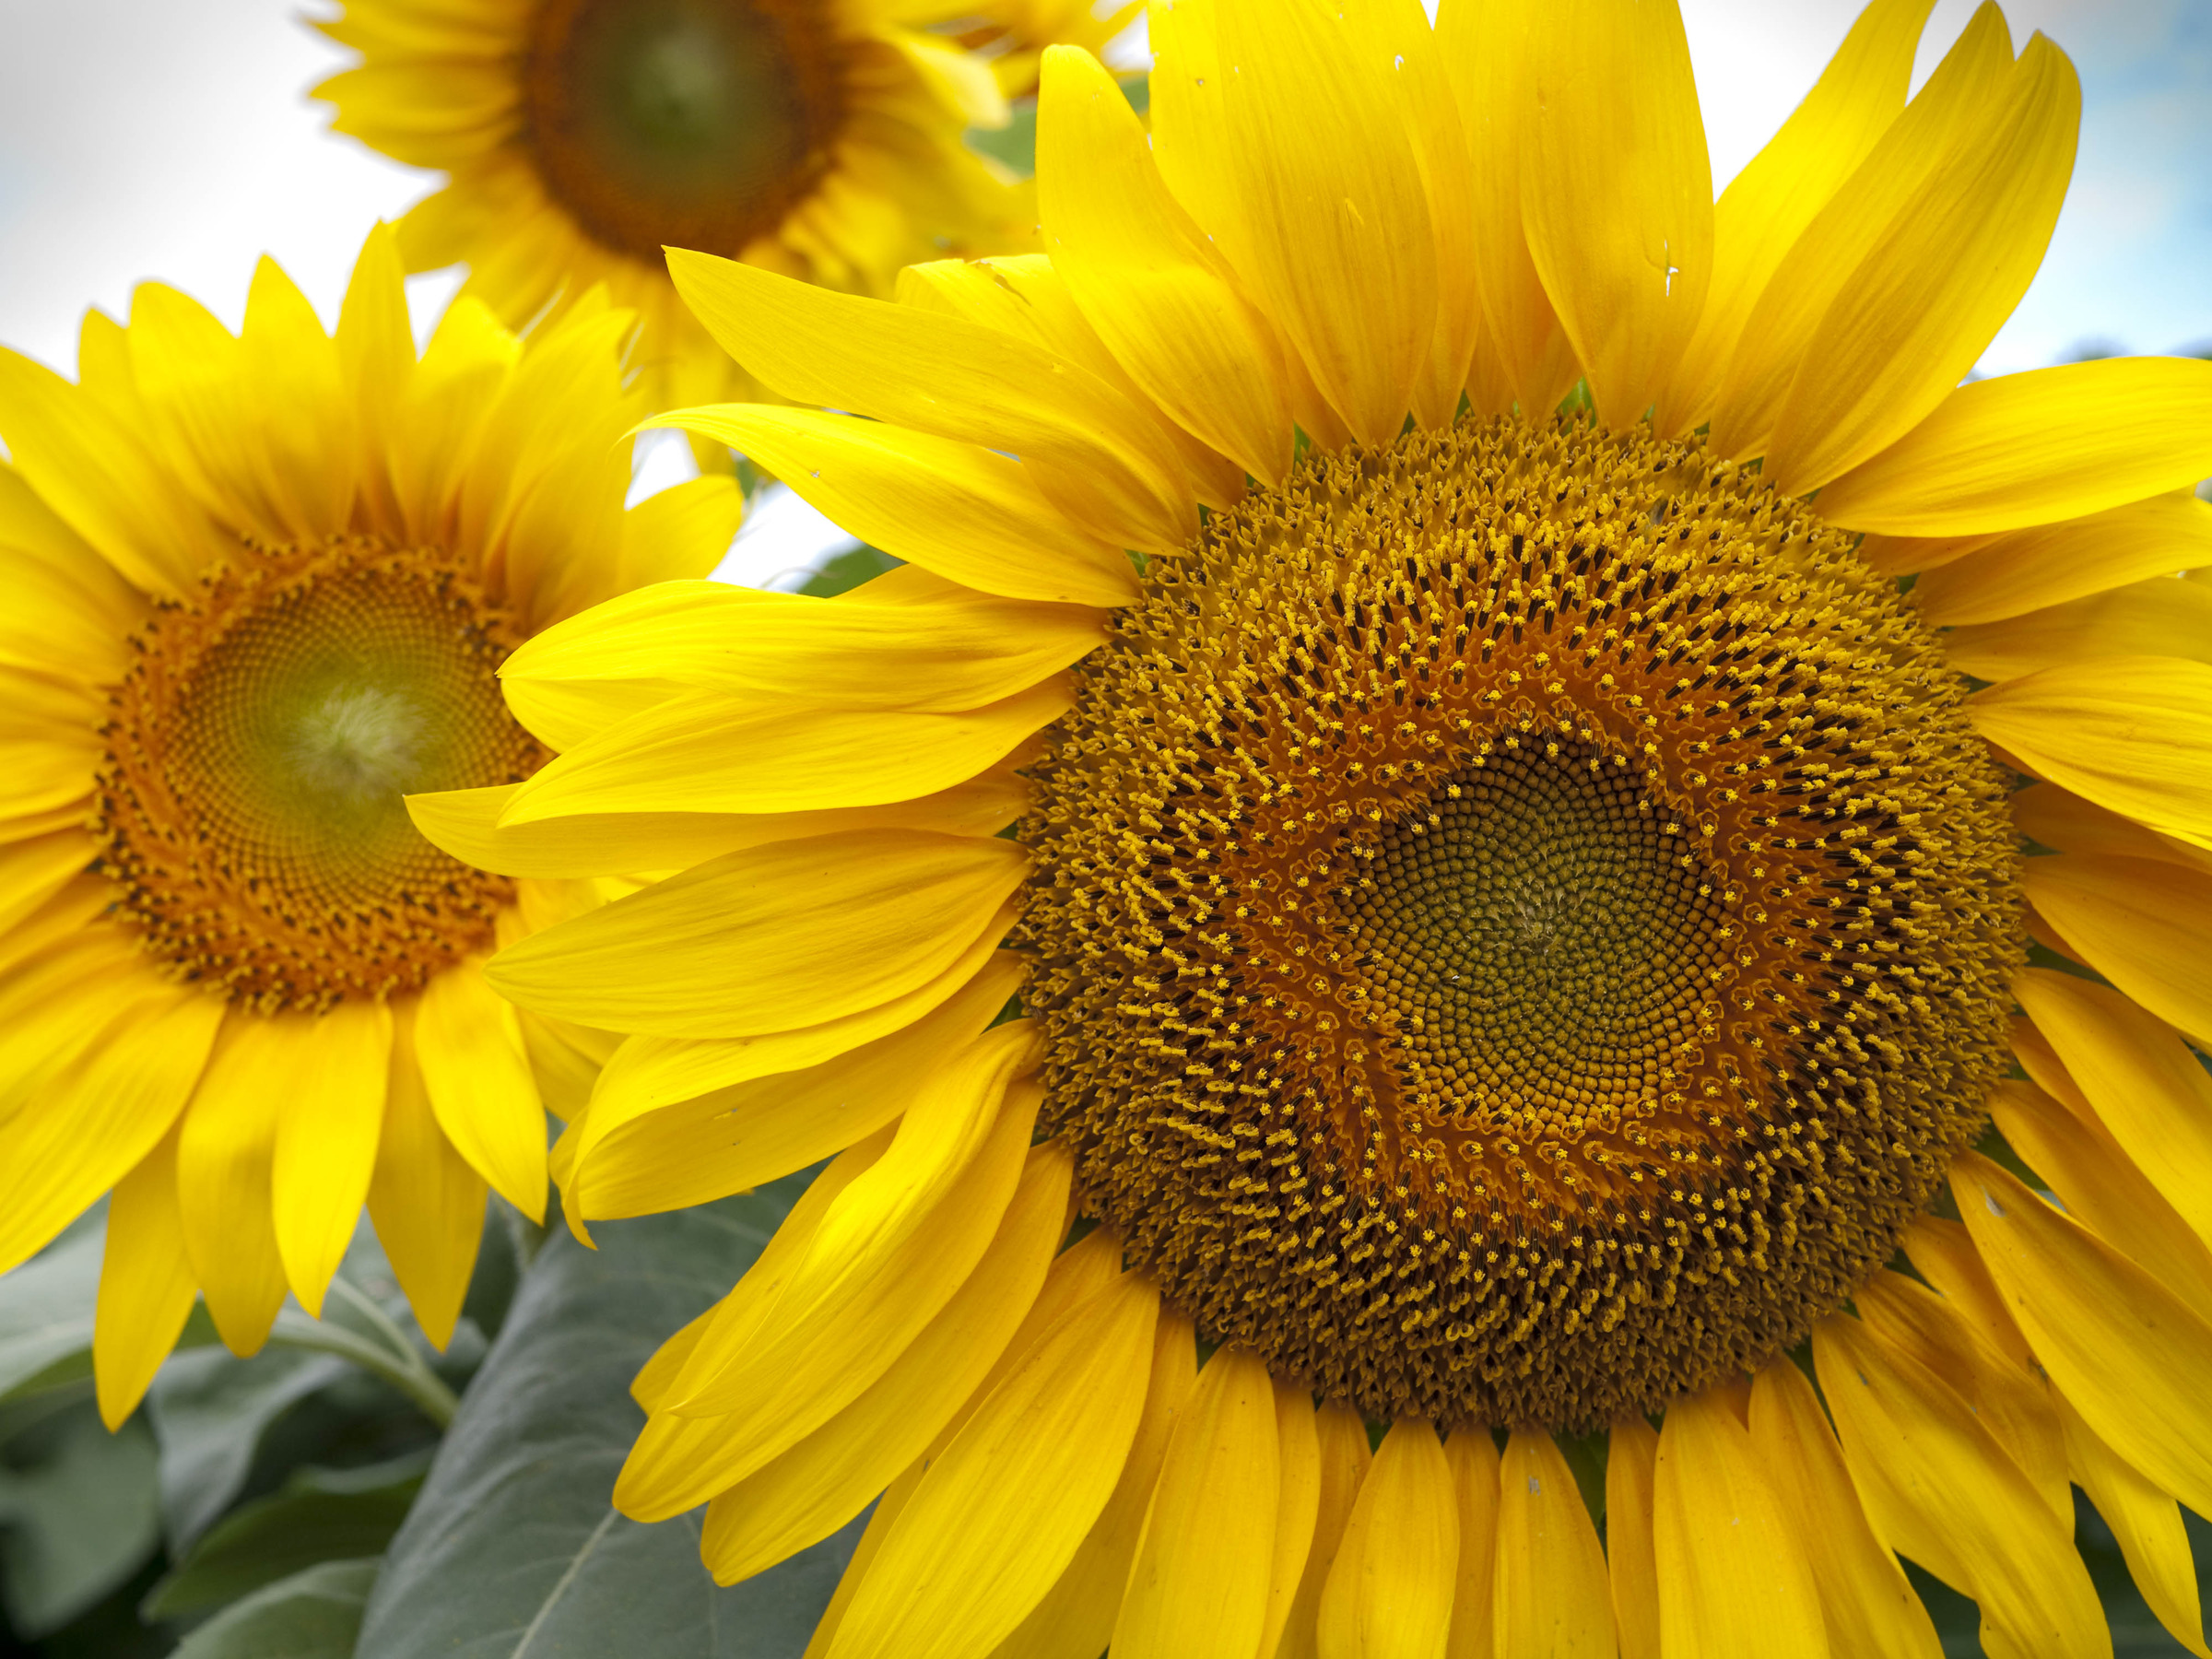 Sunflower 2 by Rich M in Regular Member Gallery